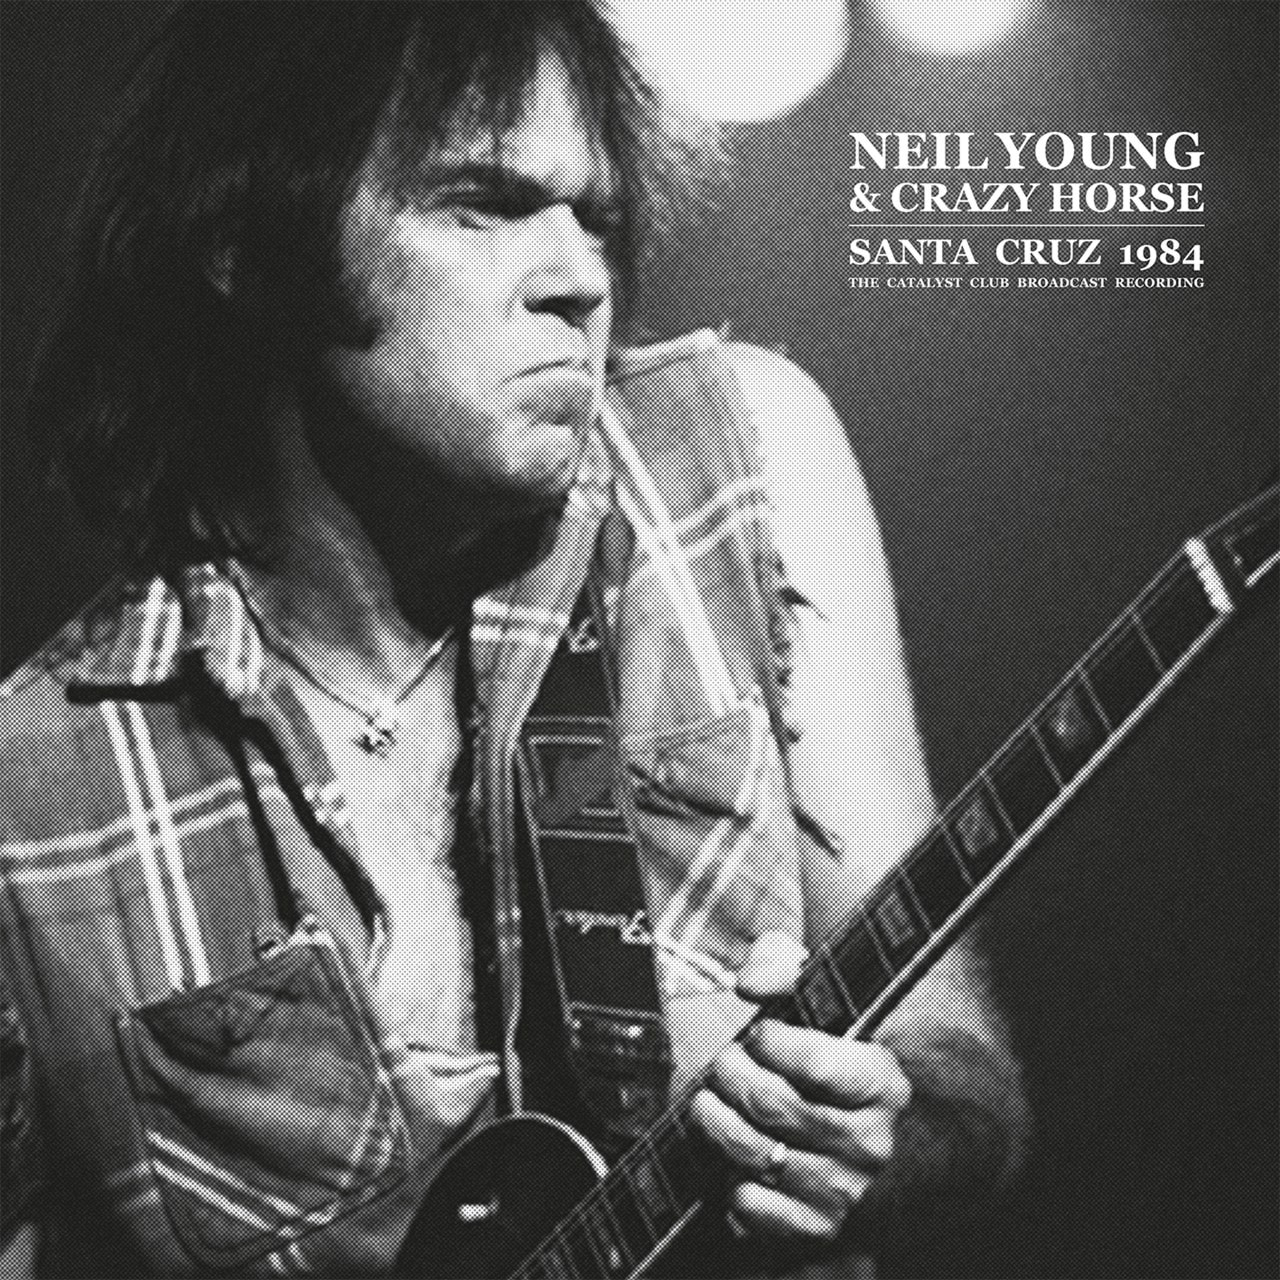 Santa Cruz 1984: The Catalyst Club Broadcast Recording - 1